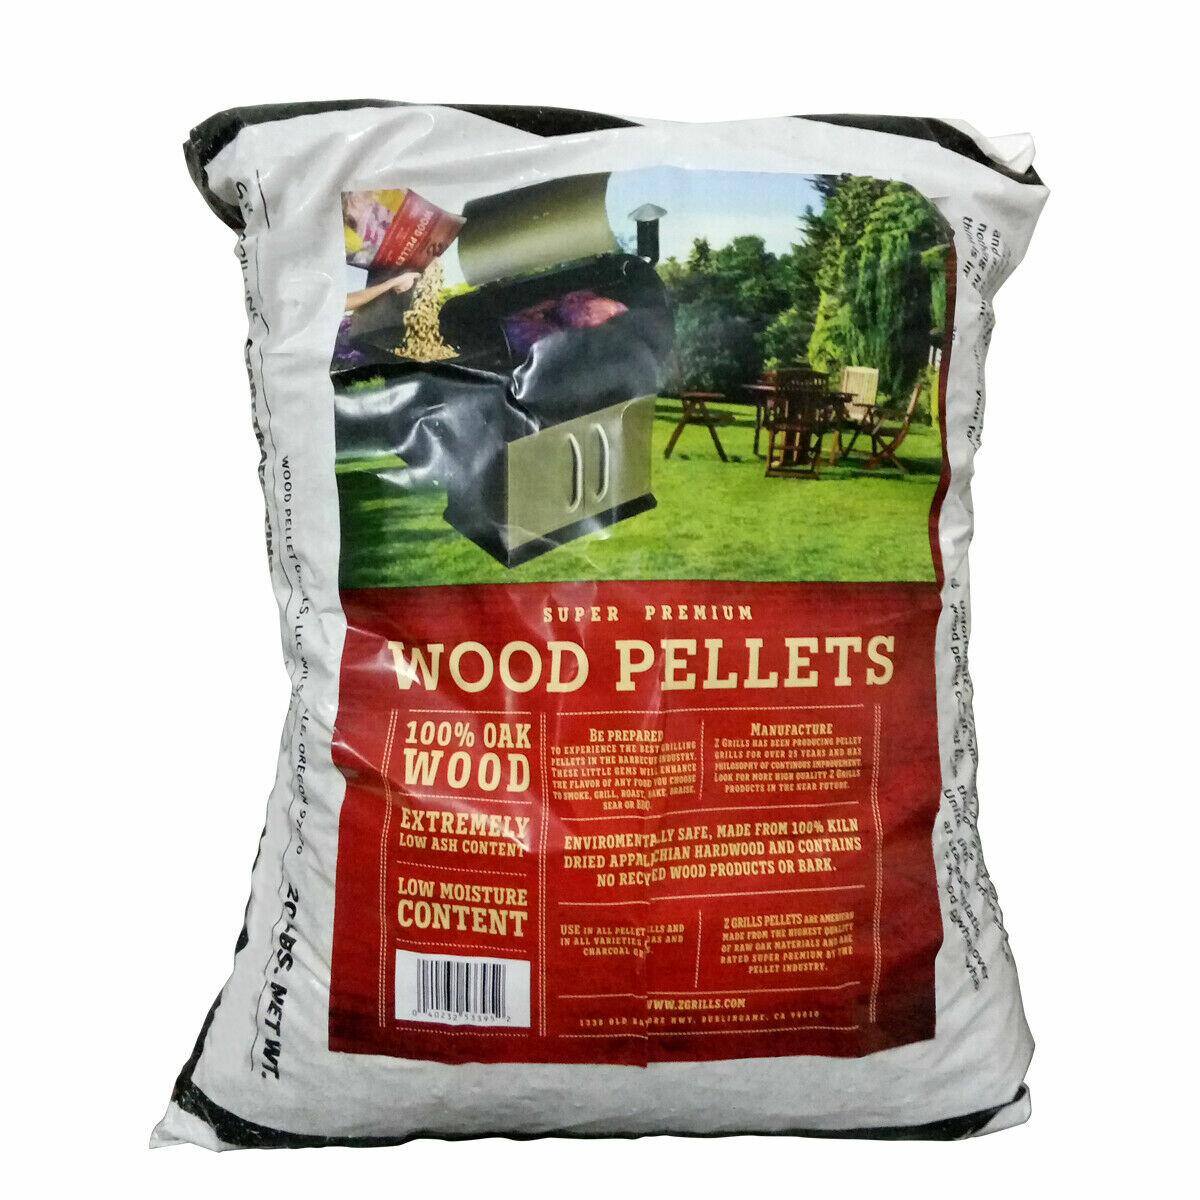 100/% All-Natural Hardwood BBQ Smoking Grill Wood Pellets 20 LB Bag